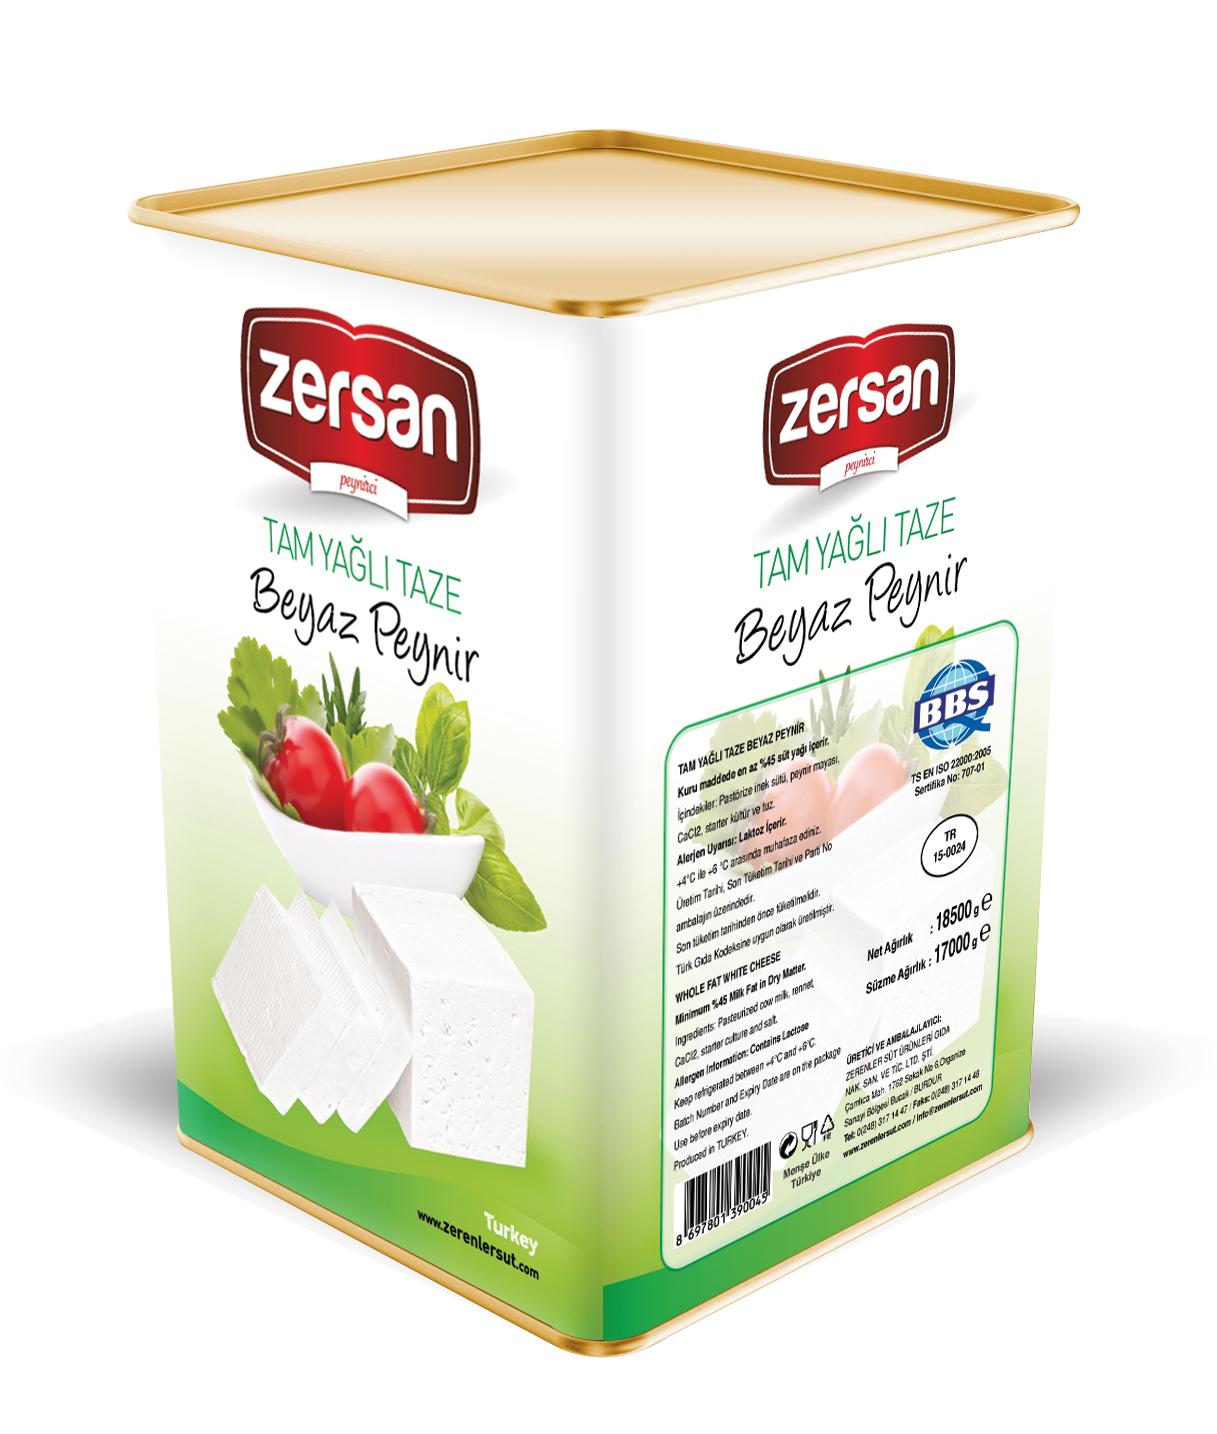 Zersan White Cheese Whole Fat